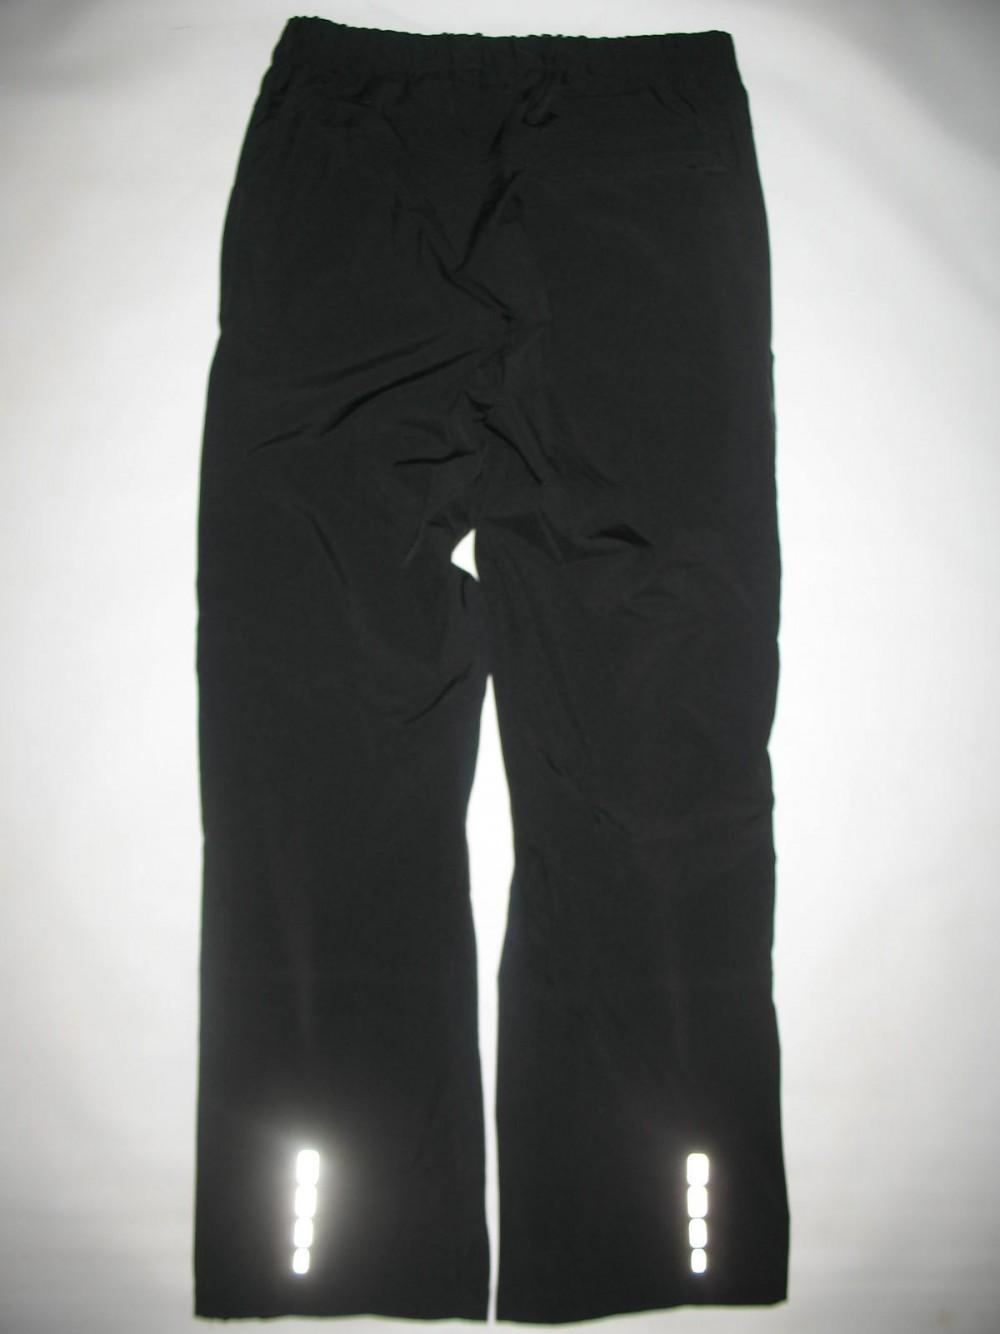 Штаны OW(ONE WAY) trekking pants (размер M) - 2